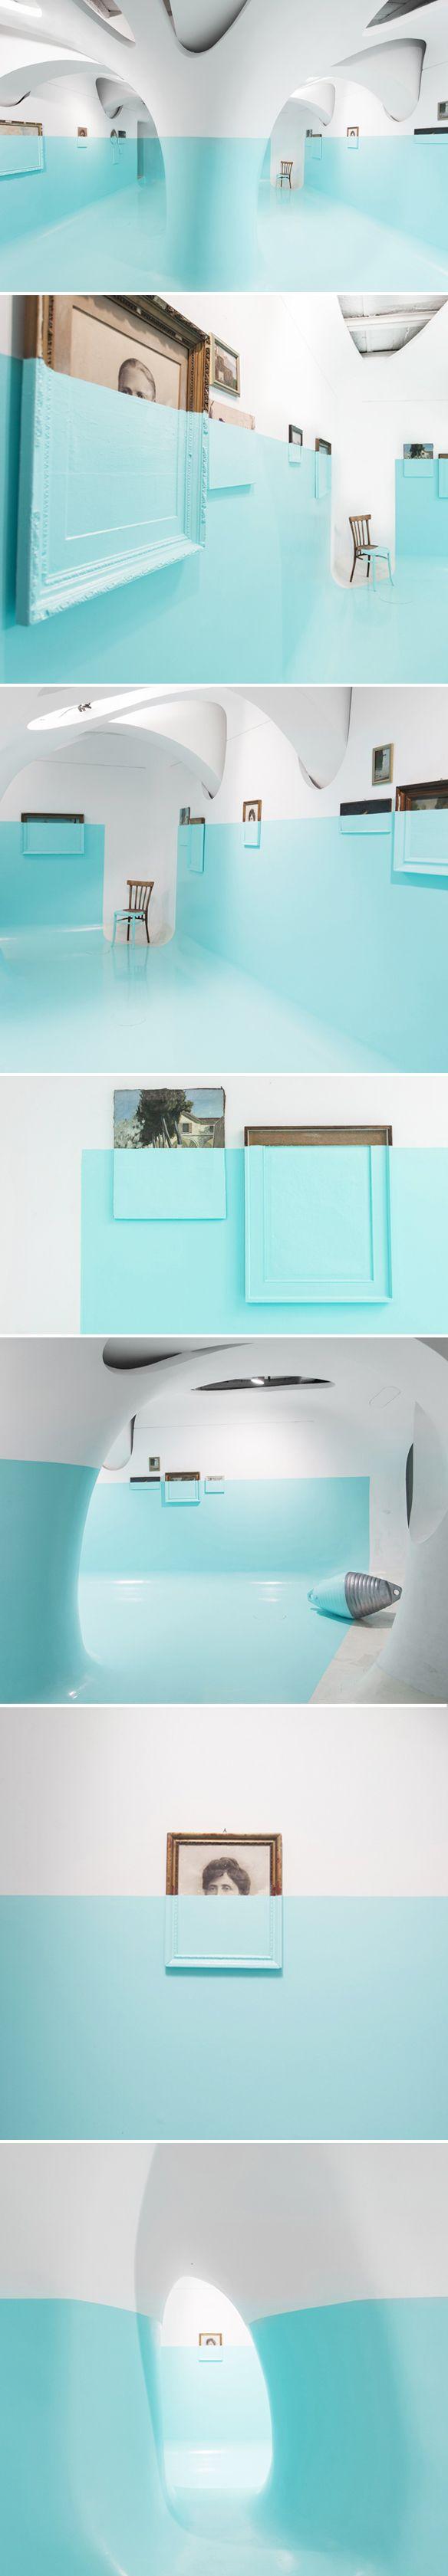 Davide d'Elia #installation #ephemeral #art #architecture #colour #inspiration #arquiectura #instalacion